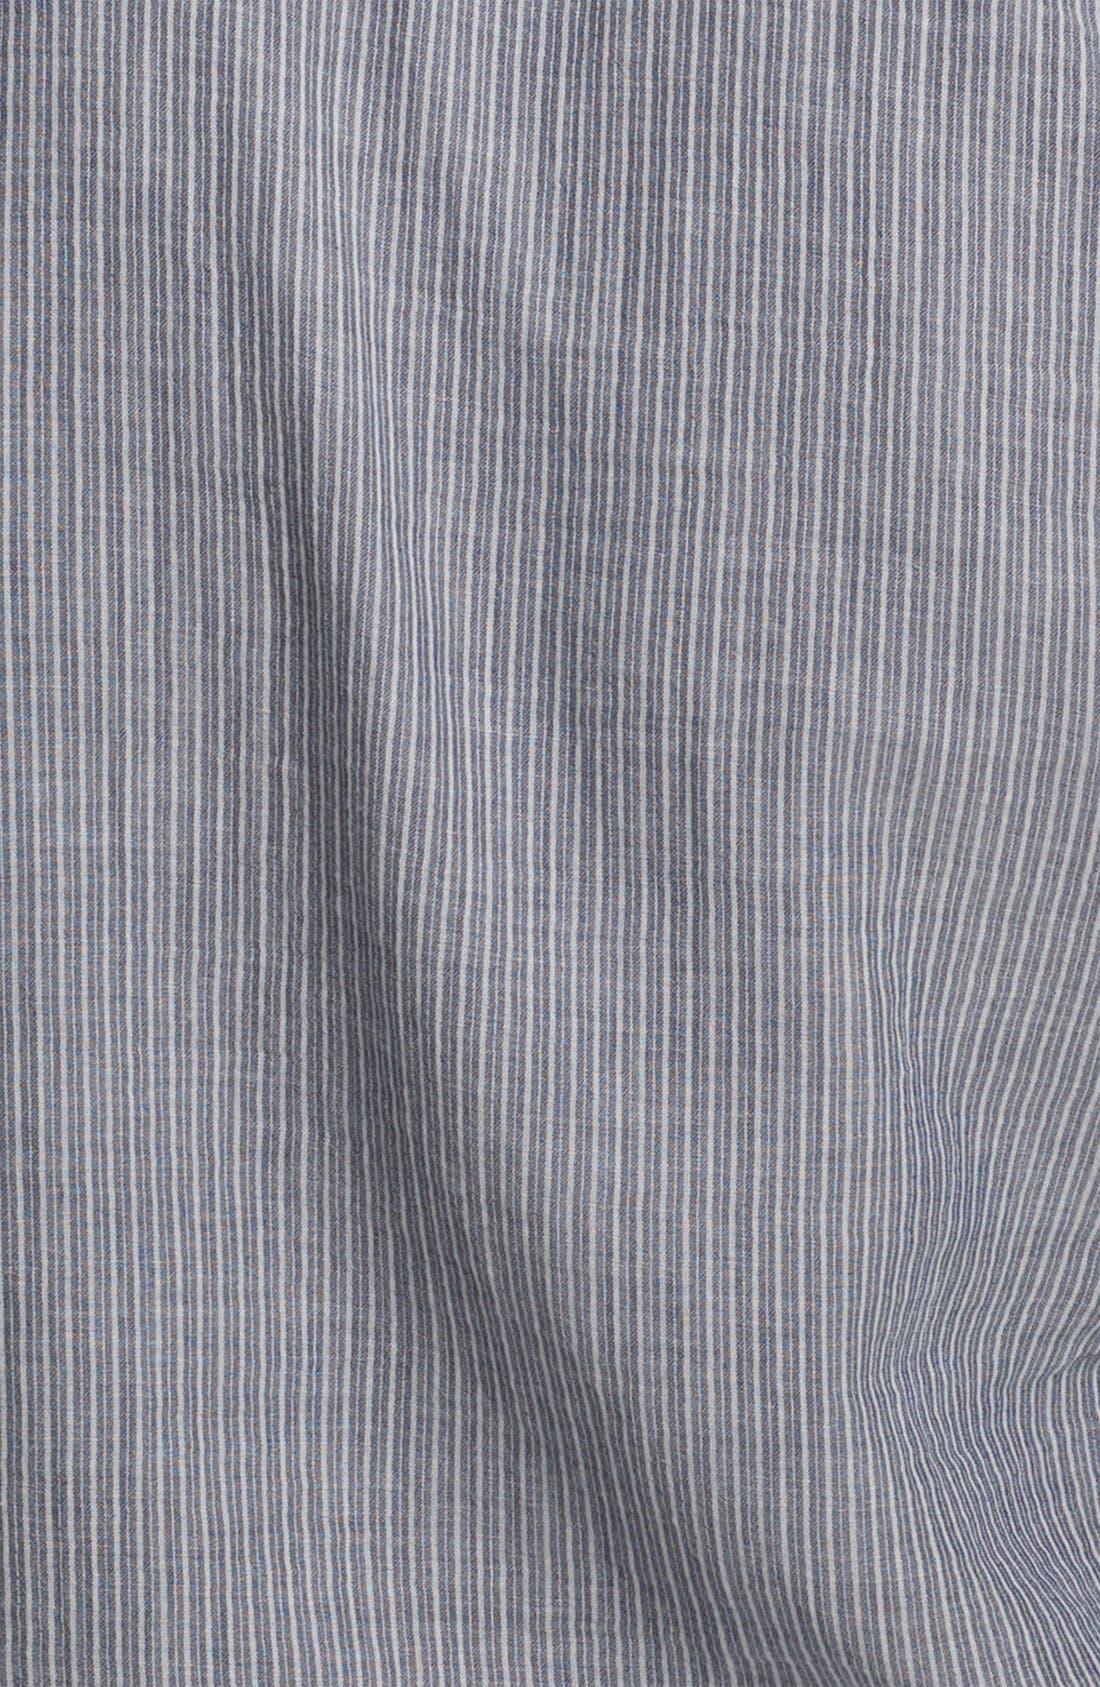 Stripe Herringbone Woven Shirt,                             Alternate thumbnail 3, color,                             400